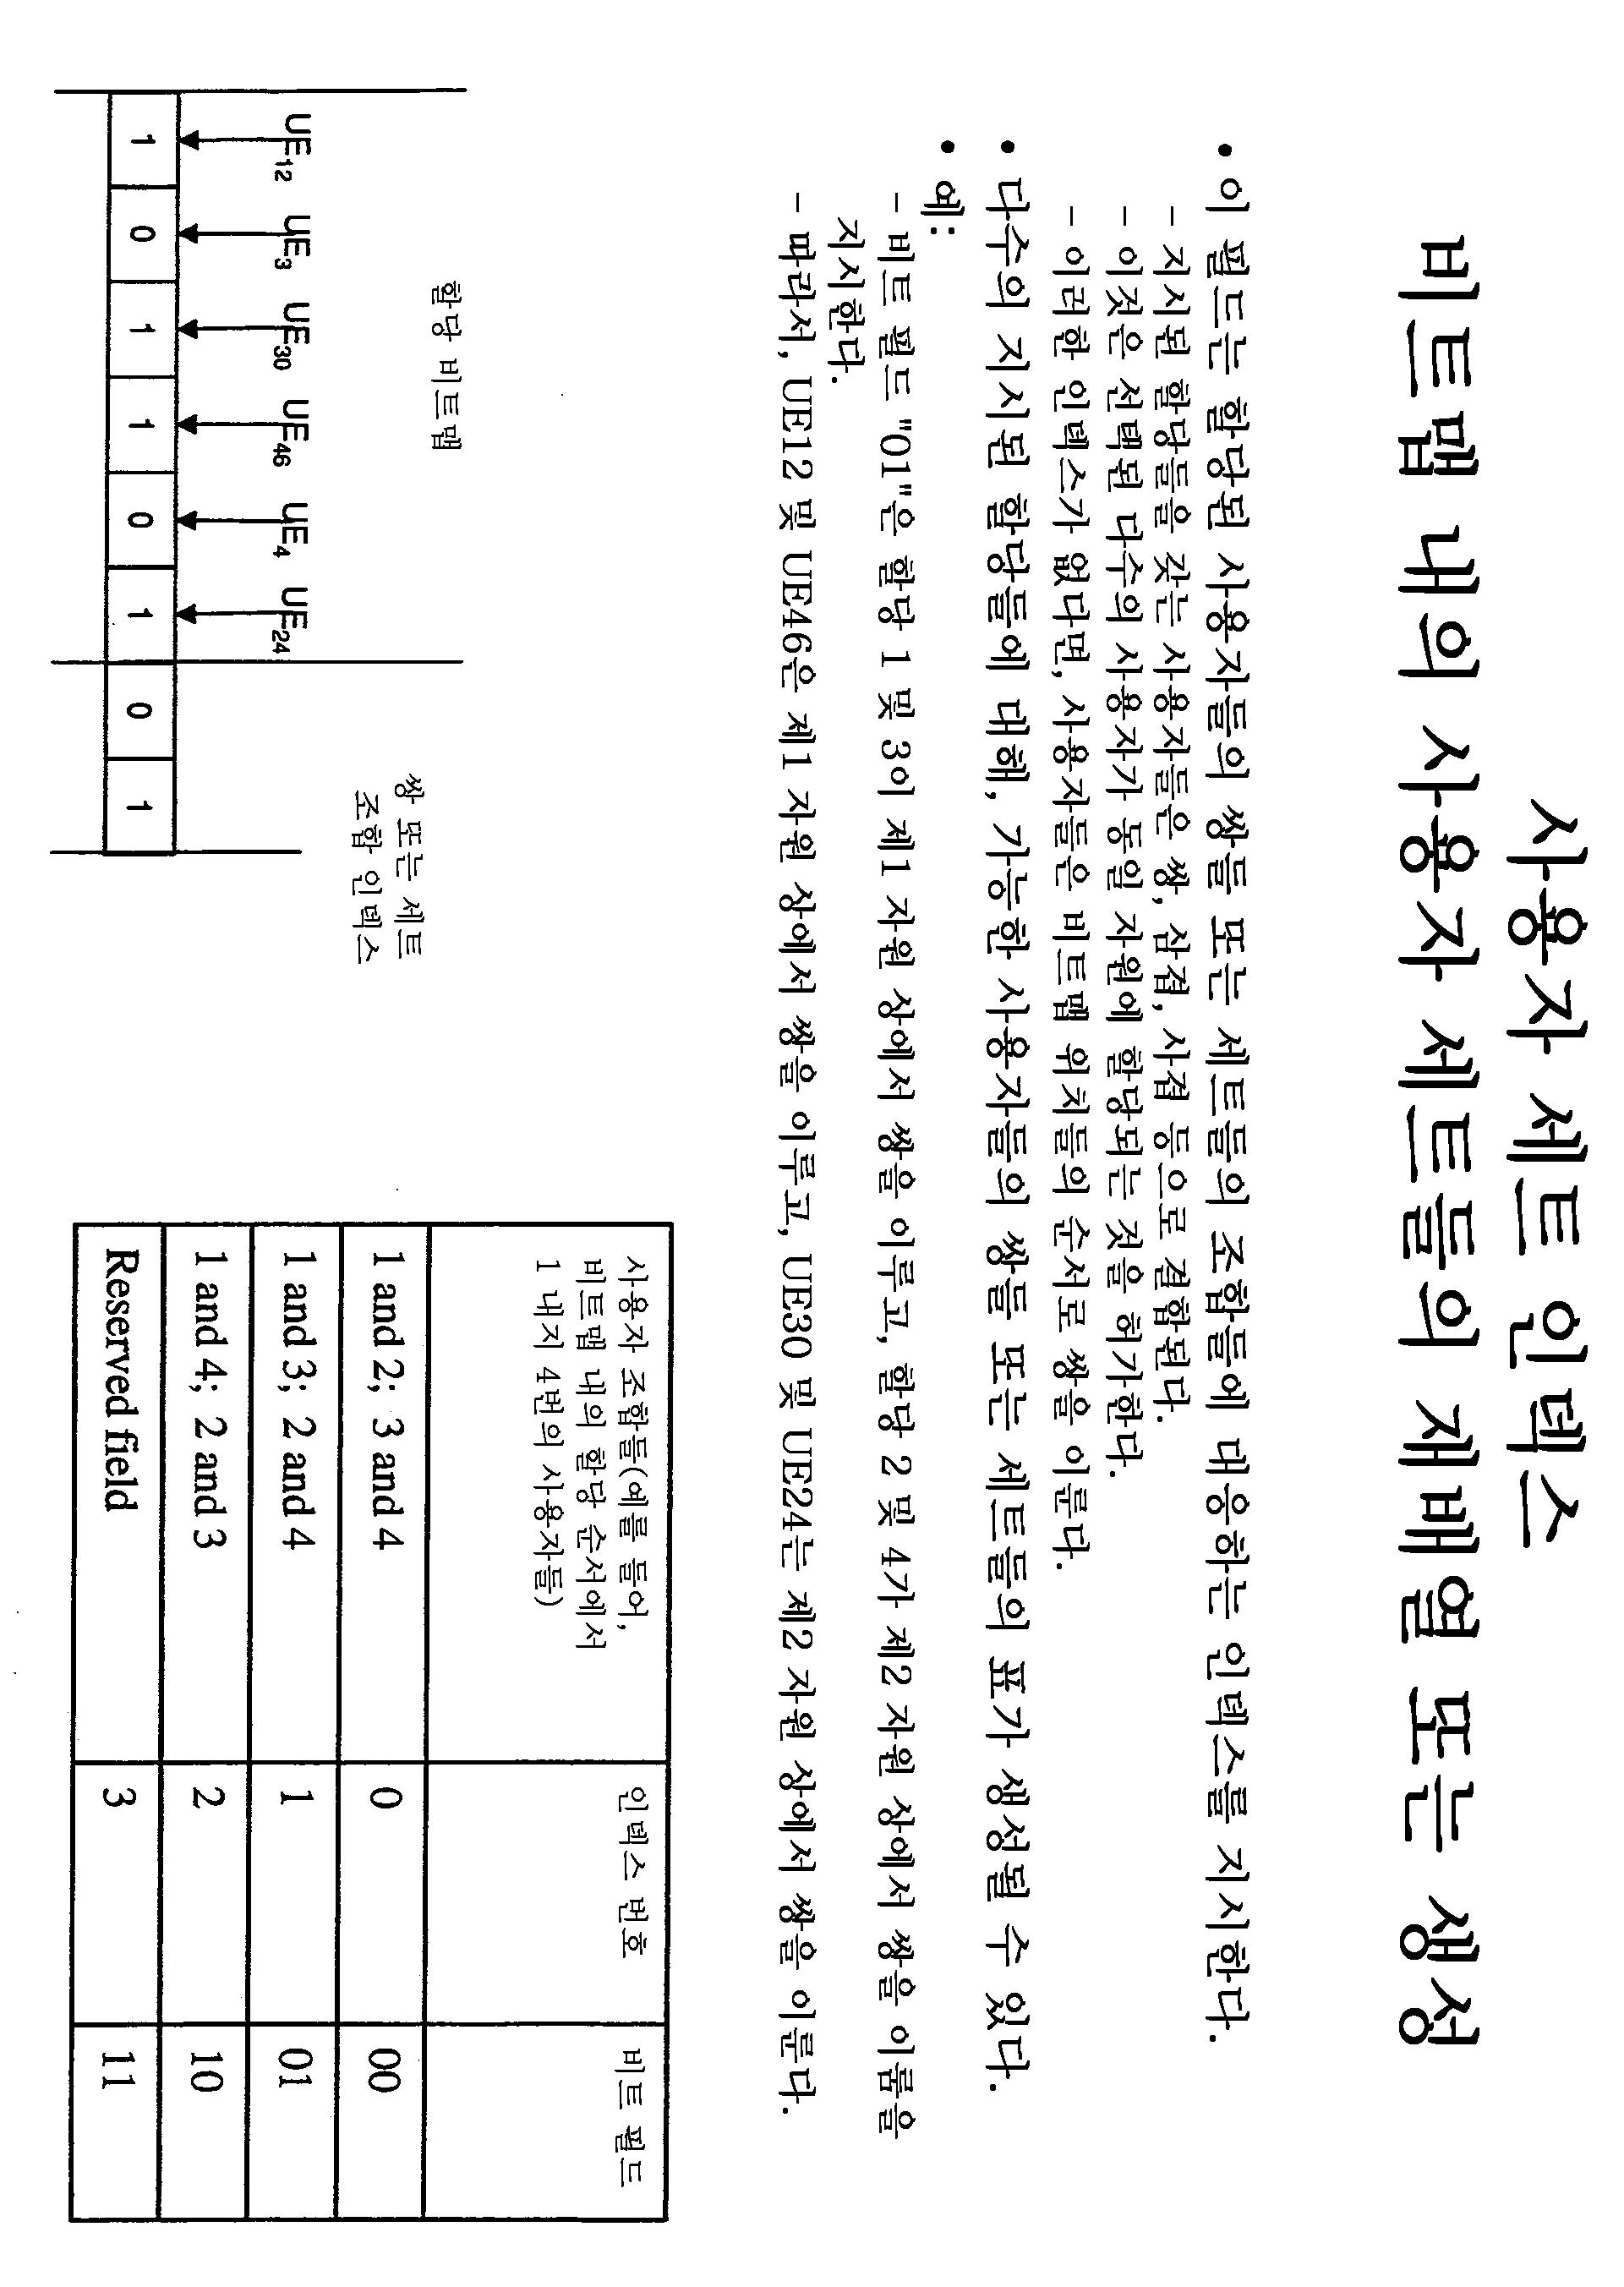 Figure 112014031700415-pat00070